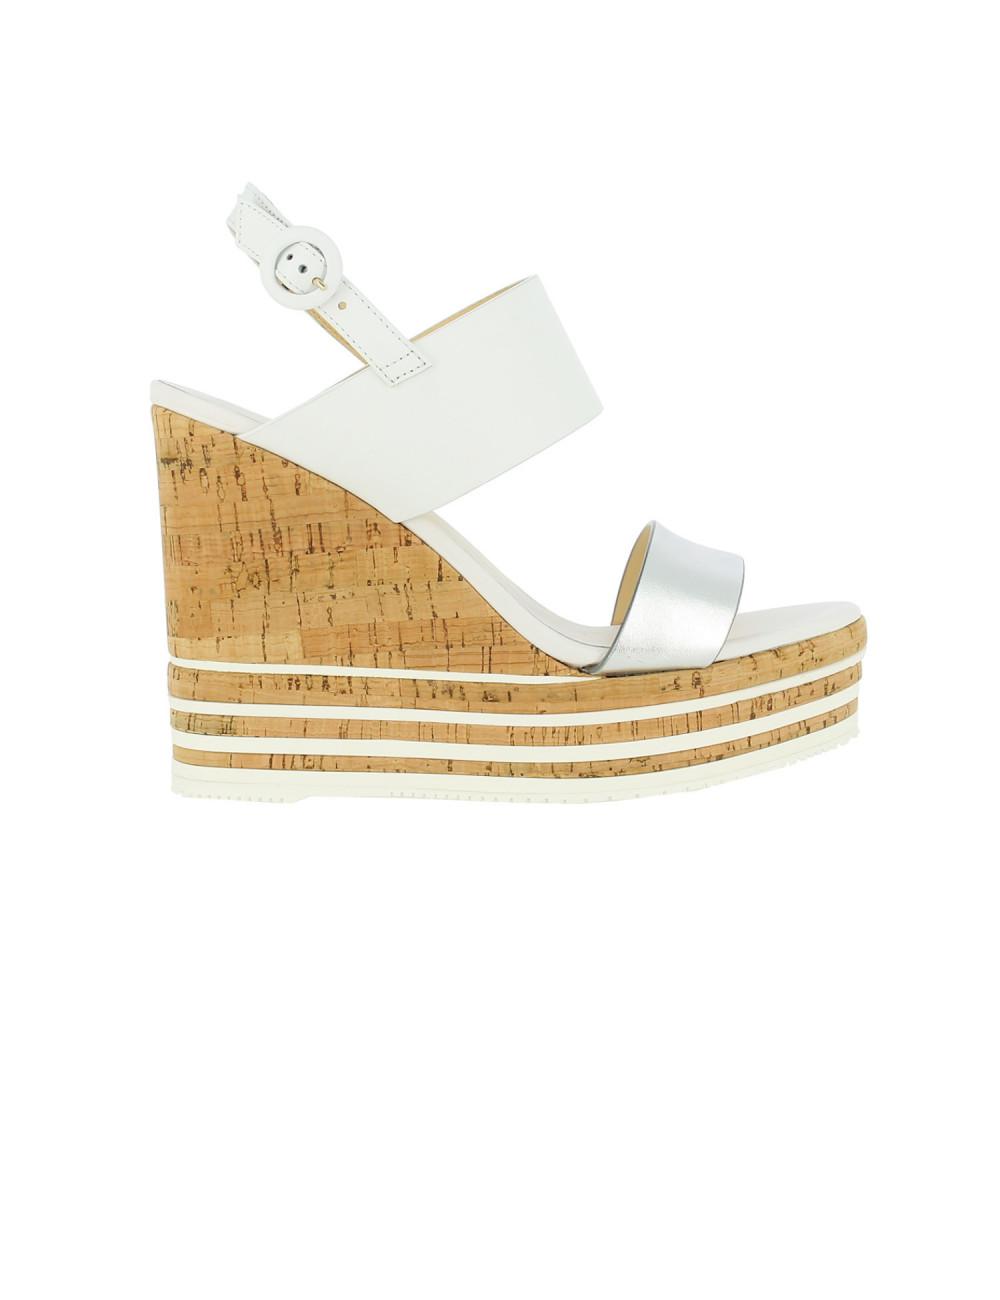 Sandalo alto con zeppa H361 Hogan